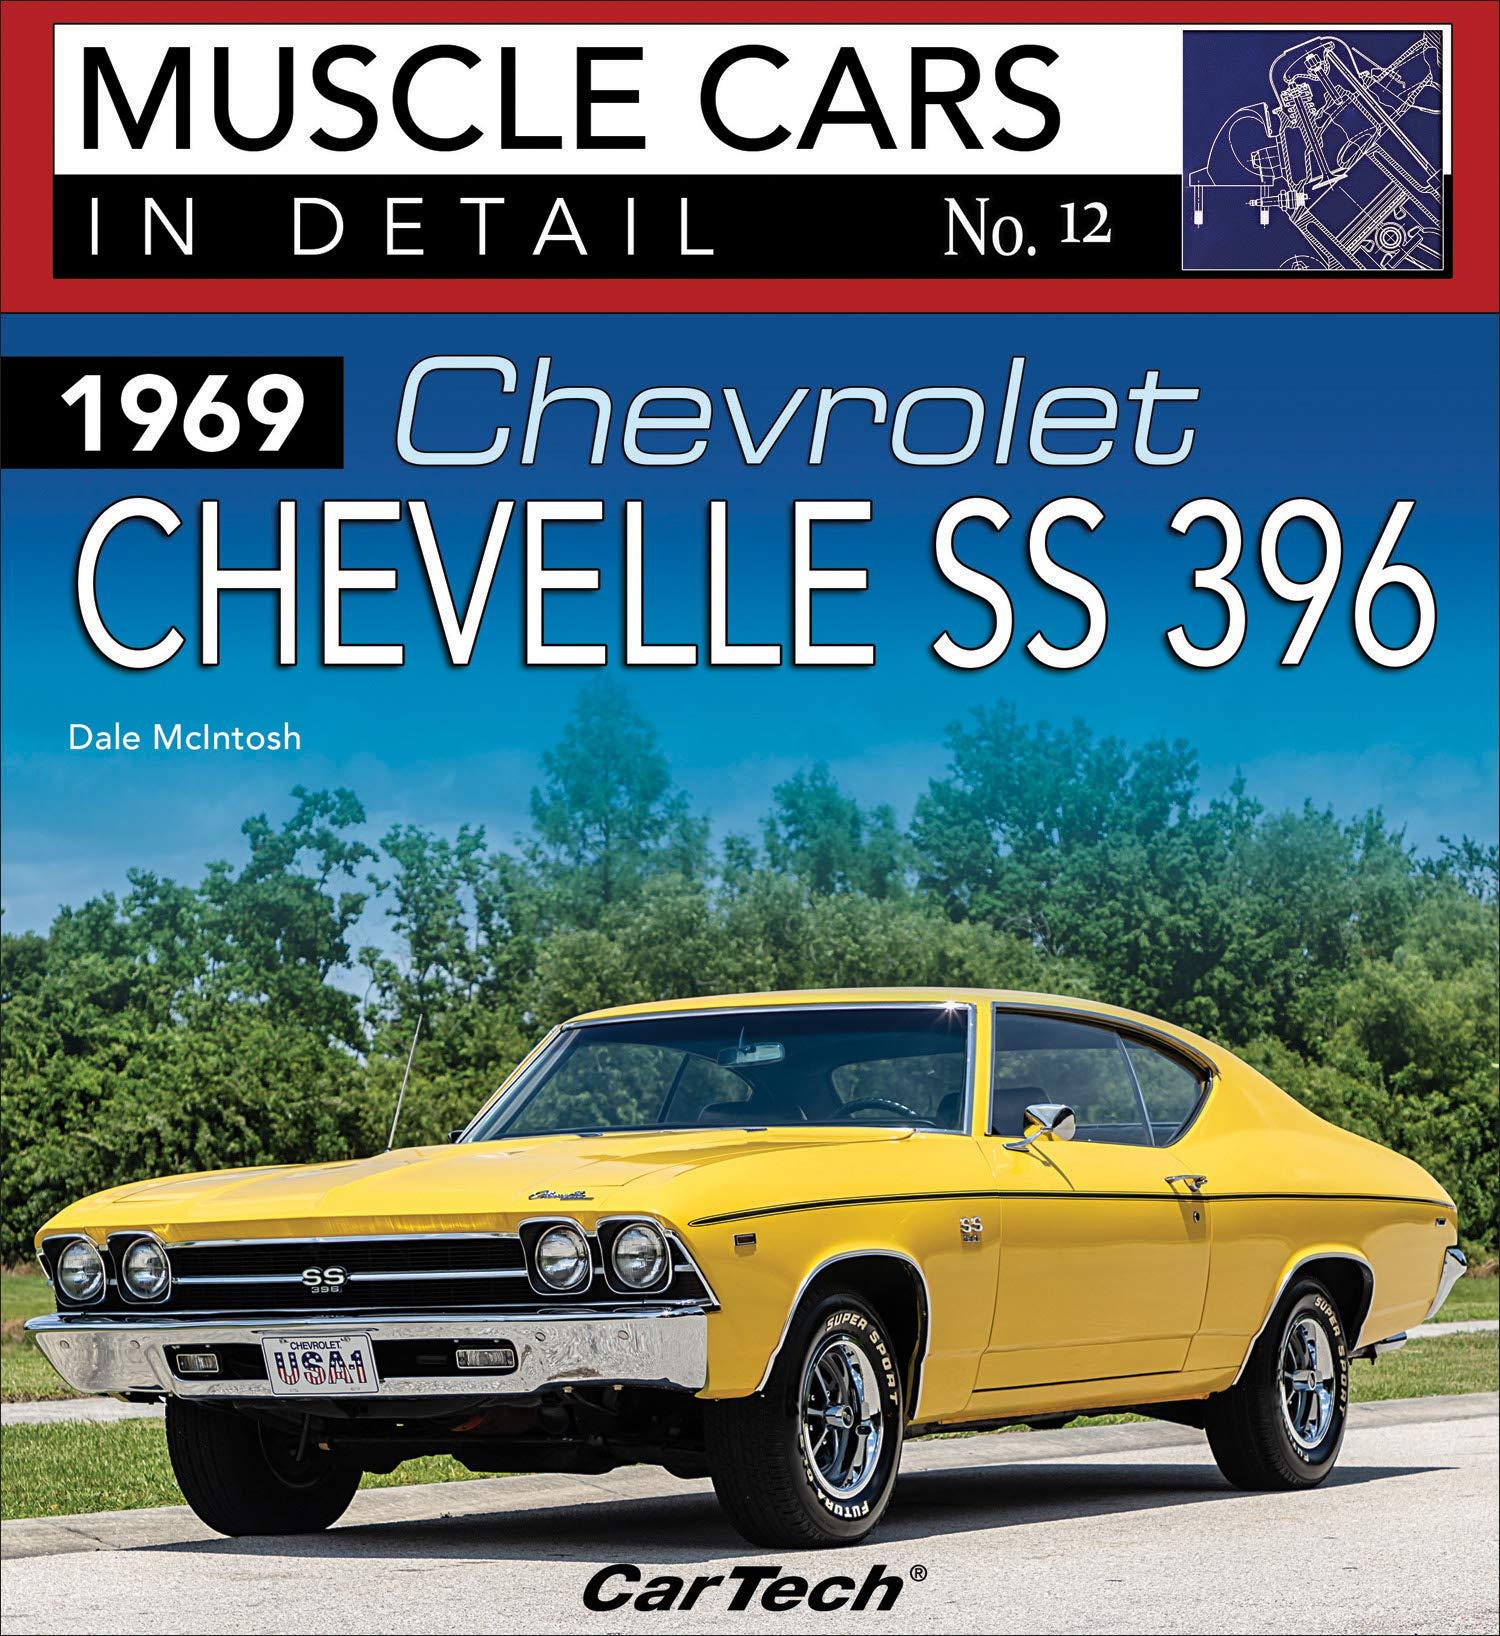 1969 Chevrolet Chevelle Ss396 Muscle Cars In Detail No 12 Amazon De Mcintosh Dale Fremdsprachige Bücher